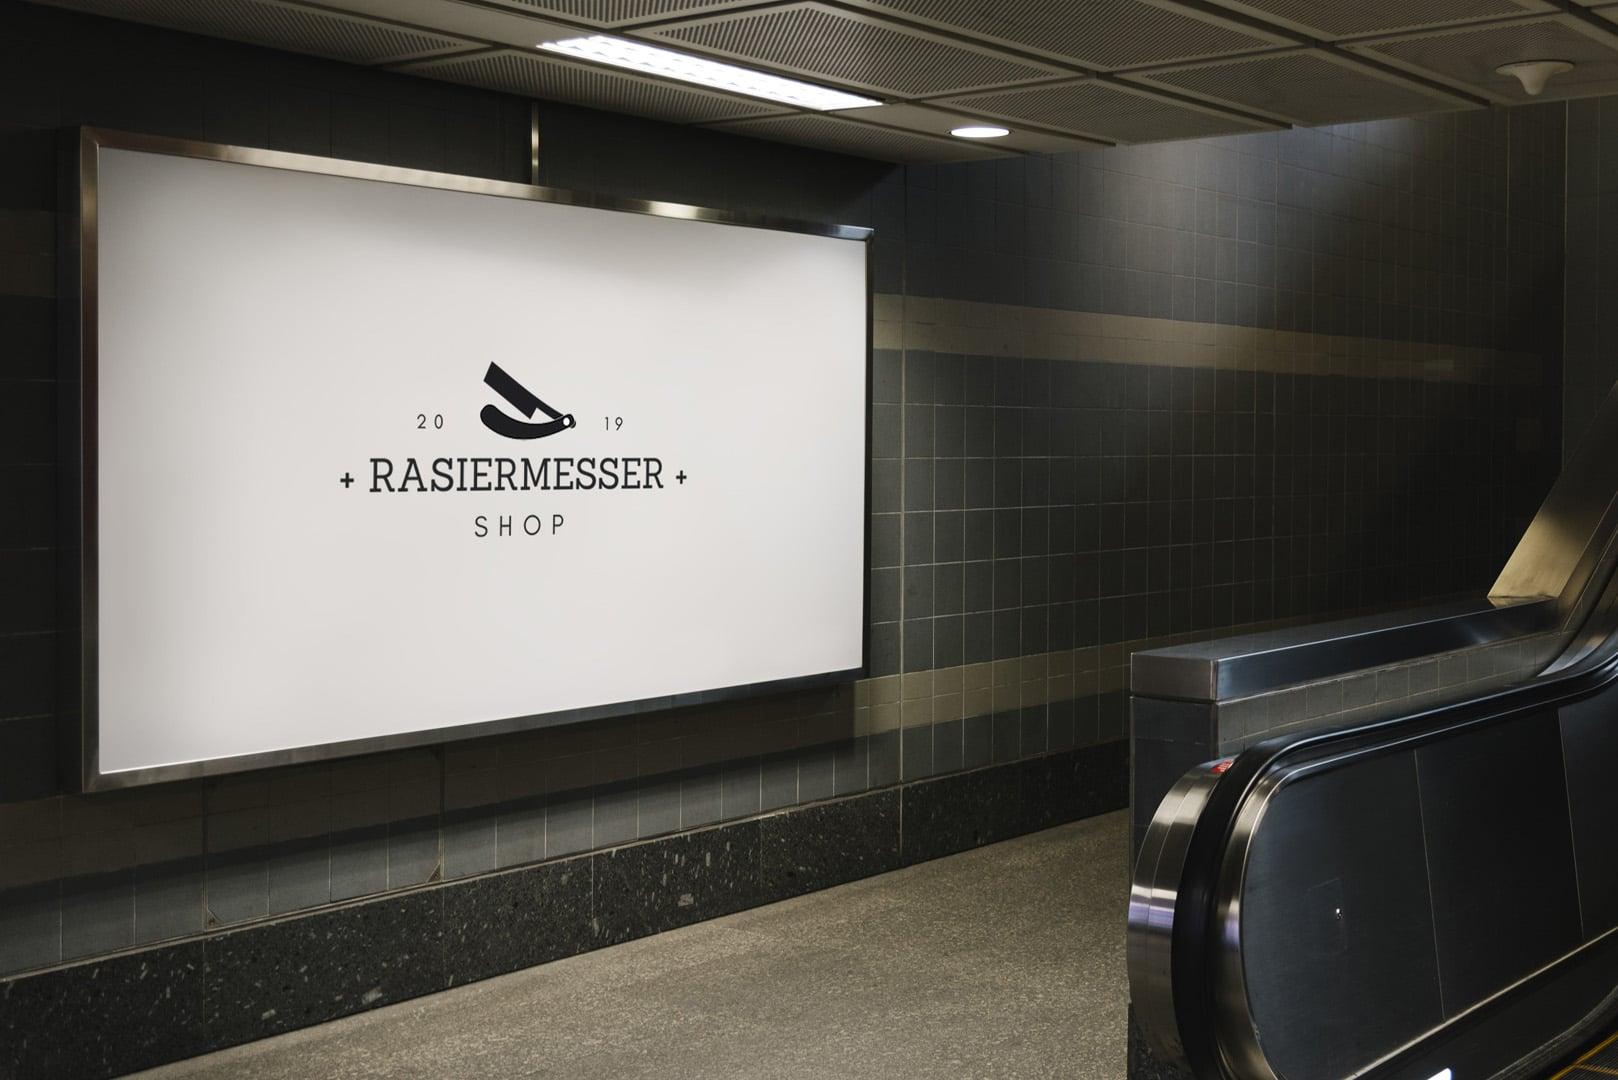 Rasiermesser Shop